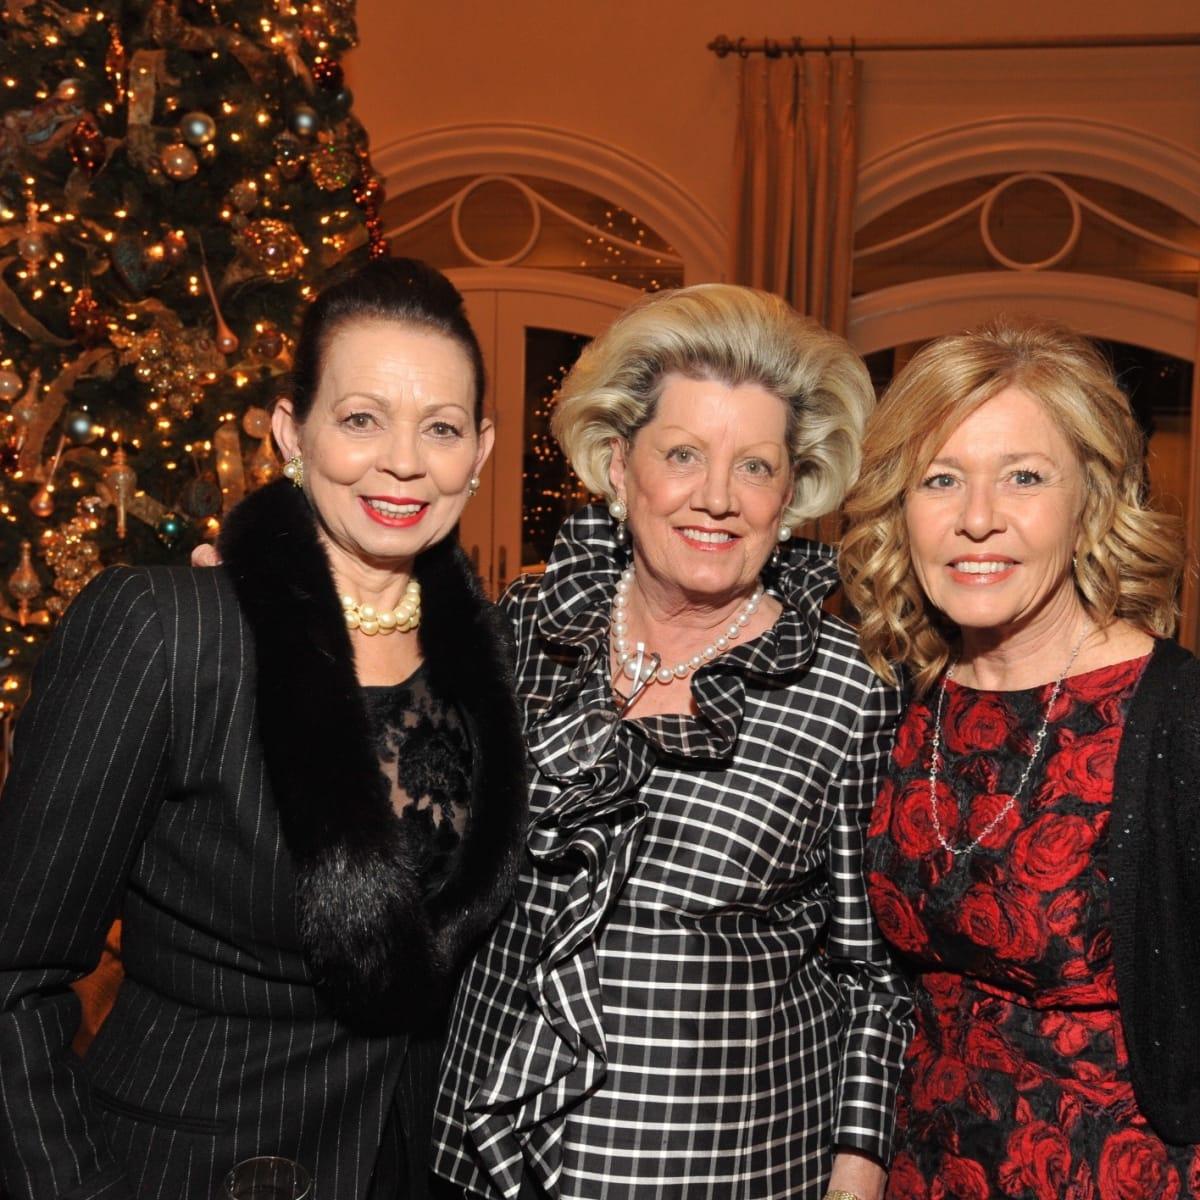 News, Kick-start gala kickoff, Dec. 2015, Danielle Ellis, Ann Brent, Rickie Prichard